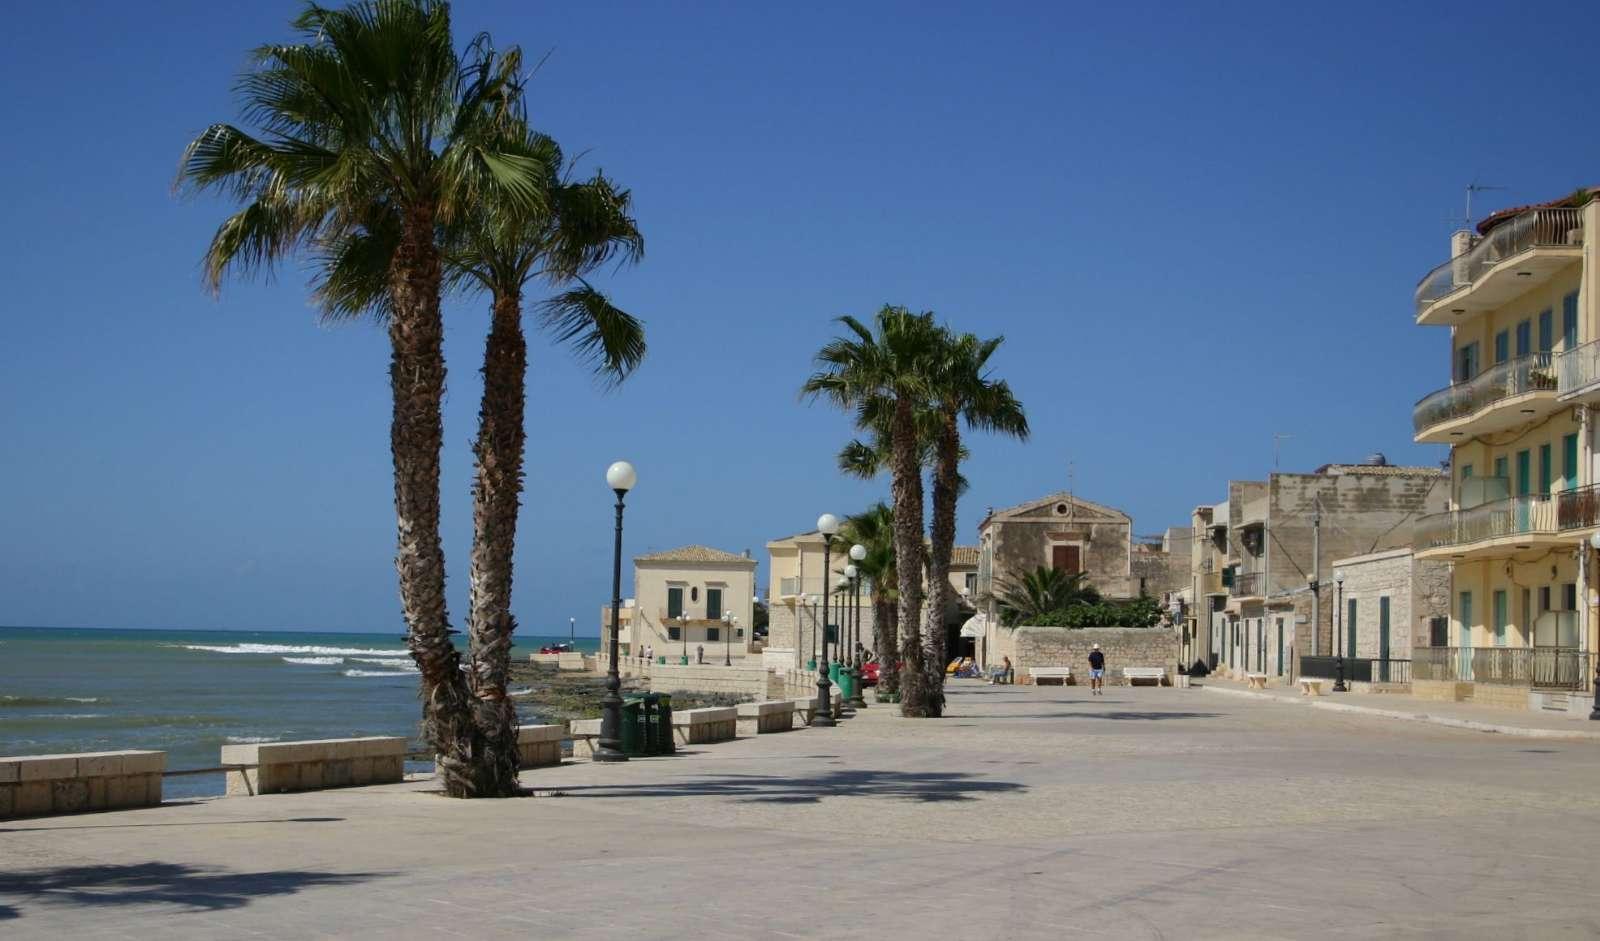 The small square next to the beach in Sampieri